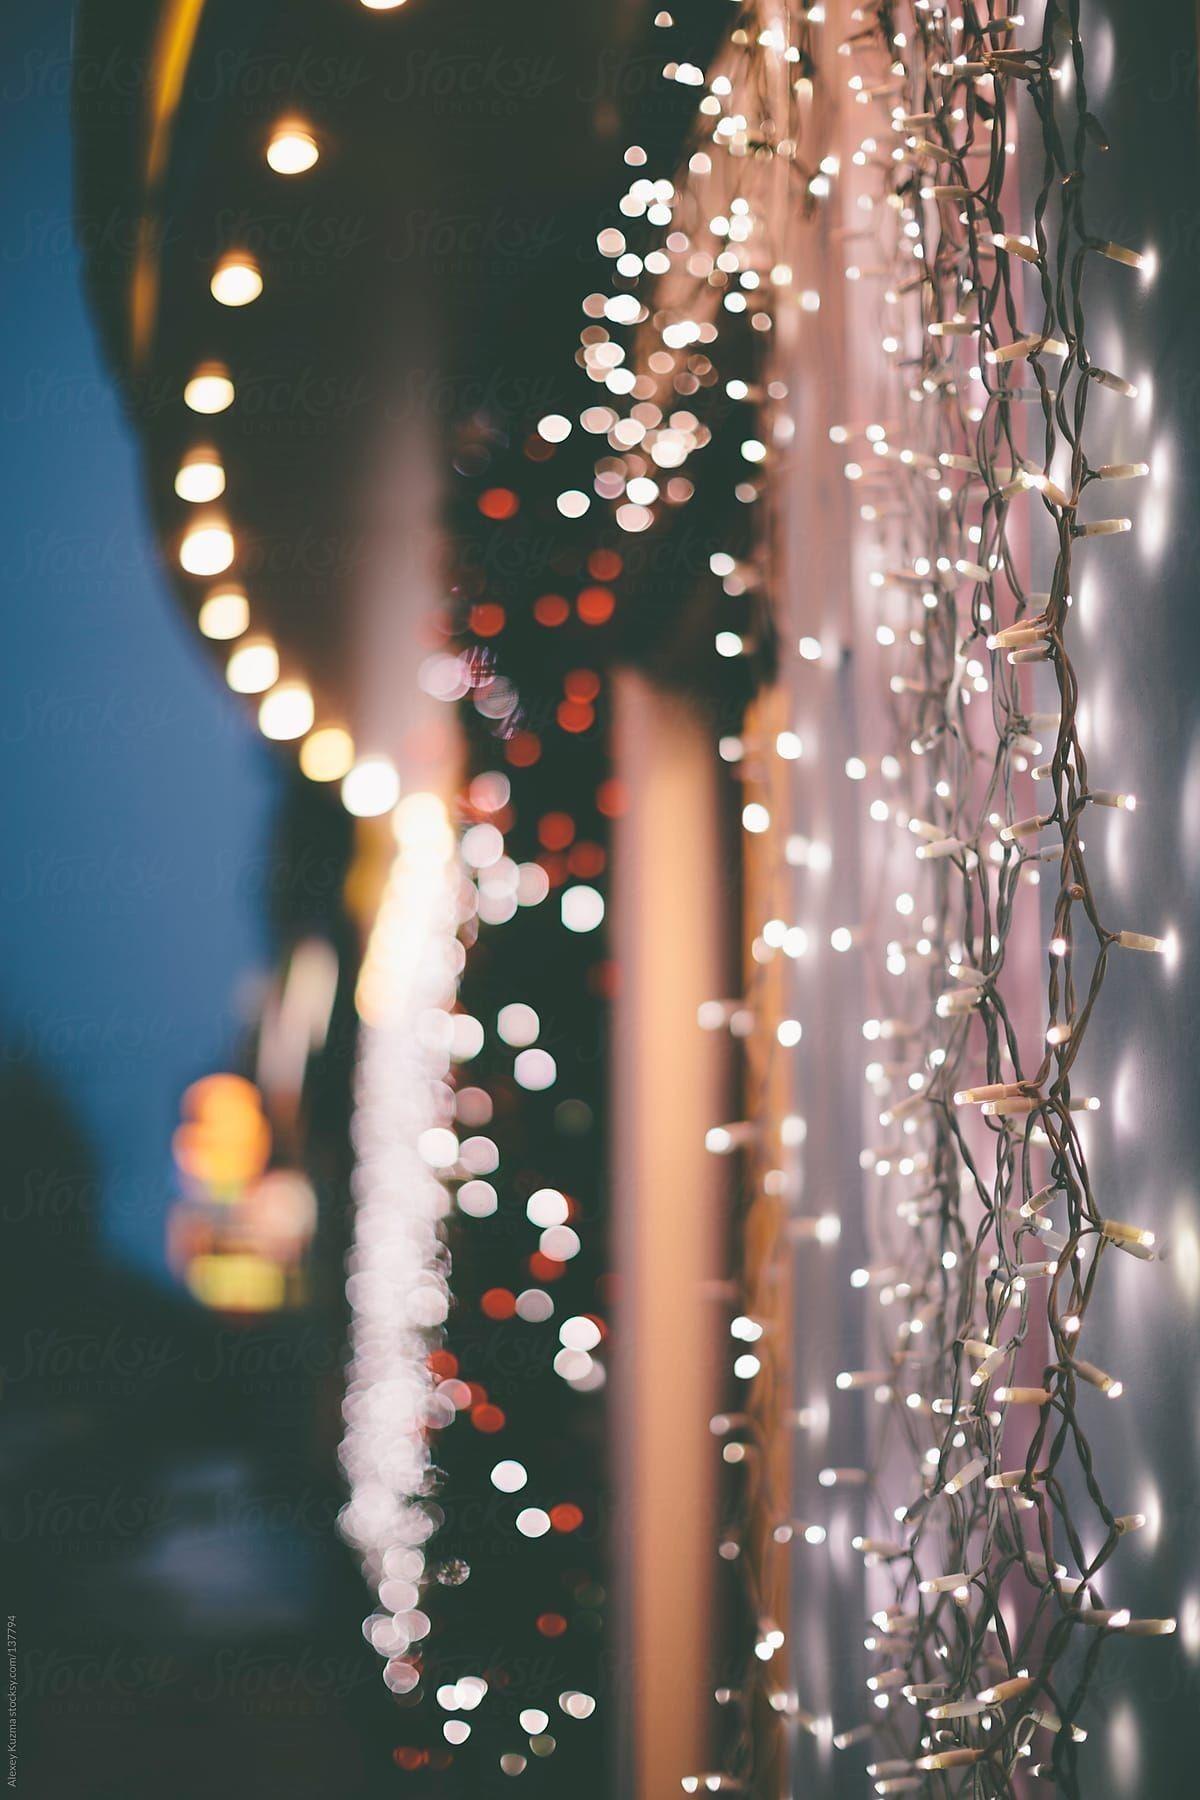 Pinterest Skylarmckellar Insta Sky Mckellar I Always Follow Back Christmas Wallpaper Iphone Tumblr Wallpaper Iphone Christmas Christmas Lights Wallpaper